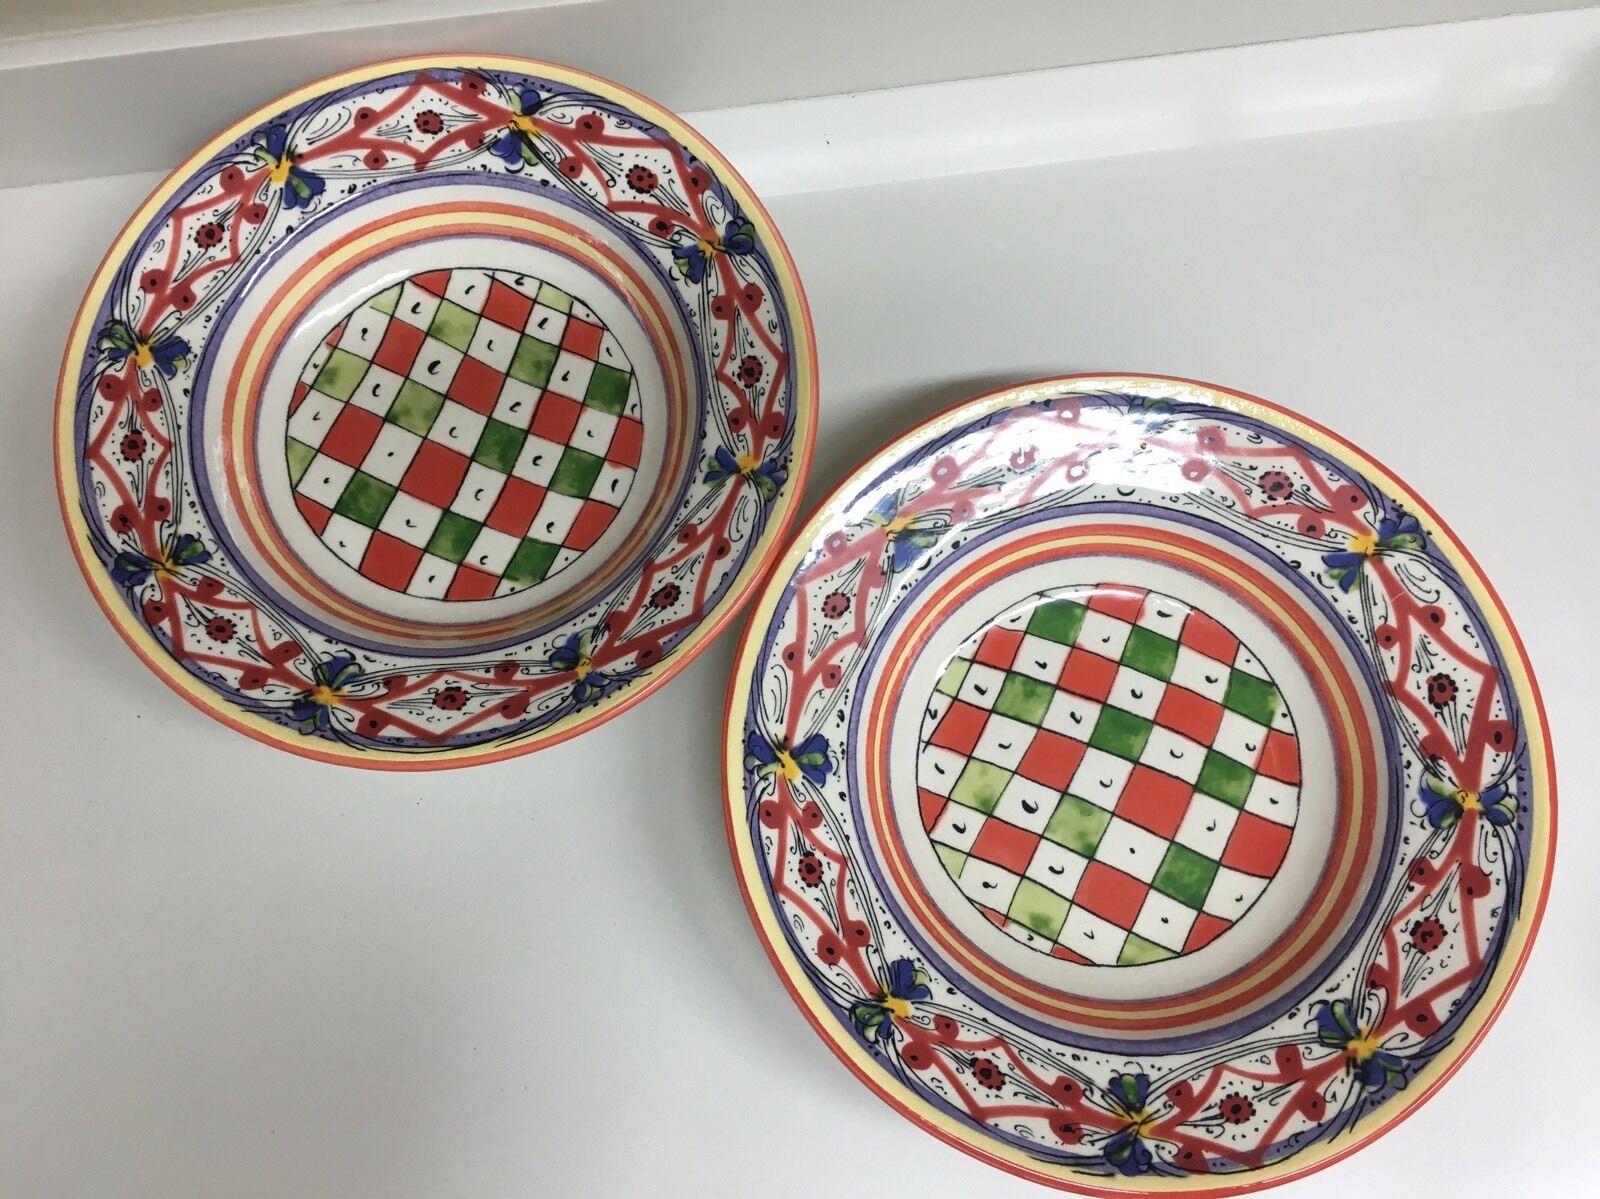 2 Williams Williams Williams Sonoma LUCCA Pasta Salad Serving Bowls Italian Pottery Large 14  db8b2d